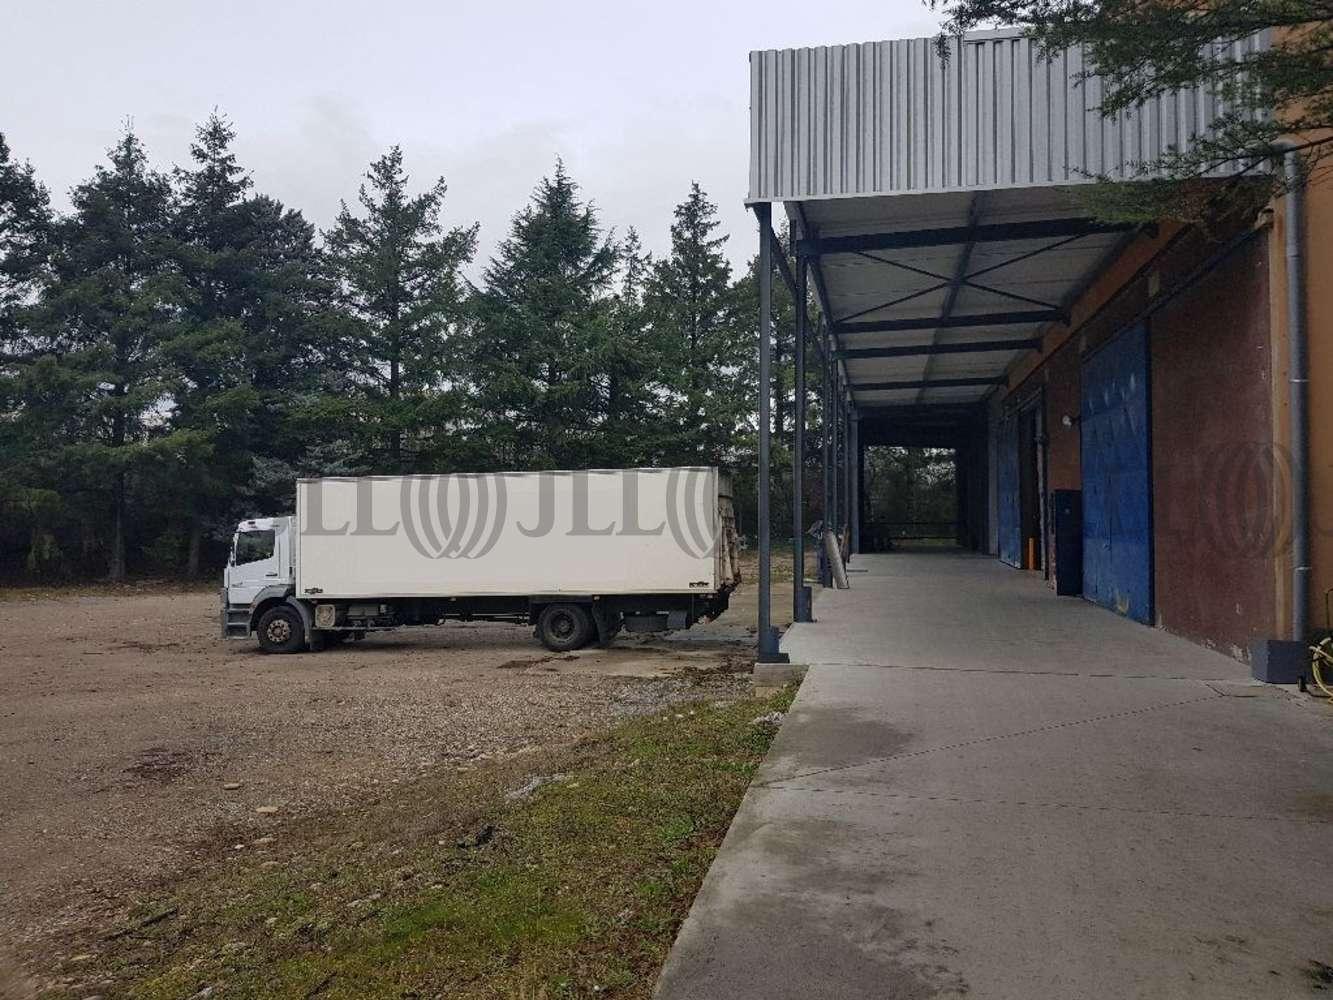 Activités/entrepôt Brignais, 69530 - Location entrepot Brignais - Grand Lyon - 10029772